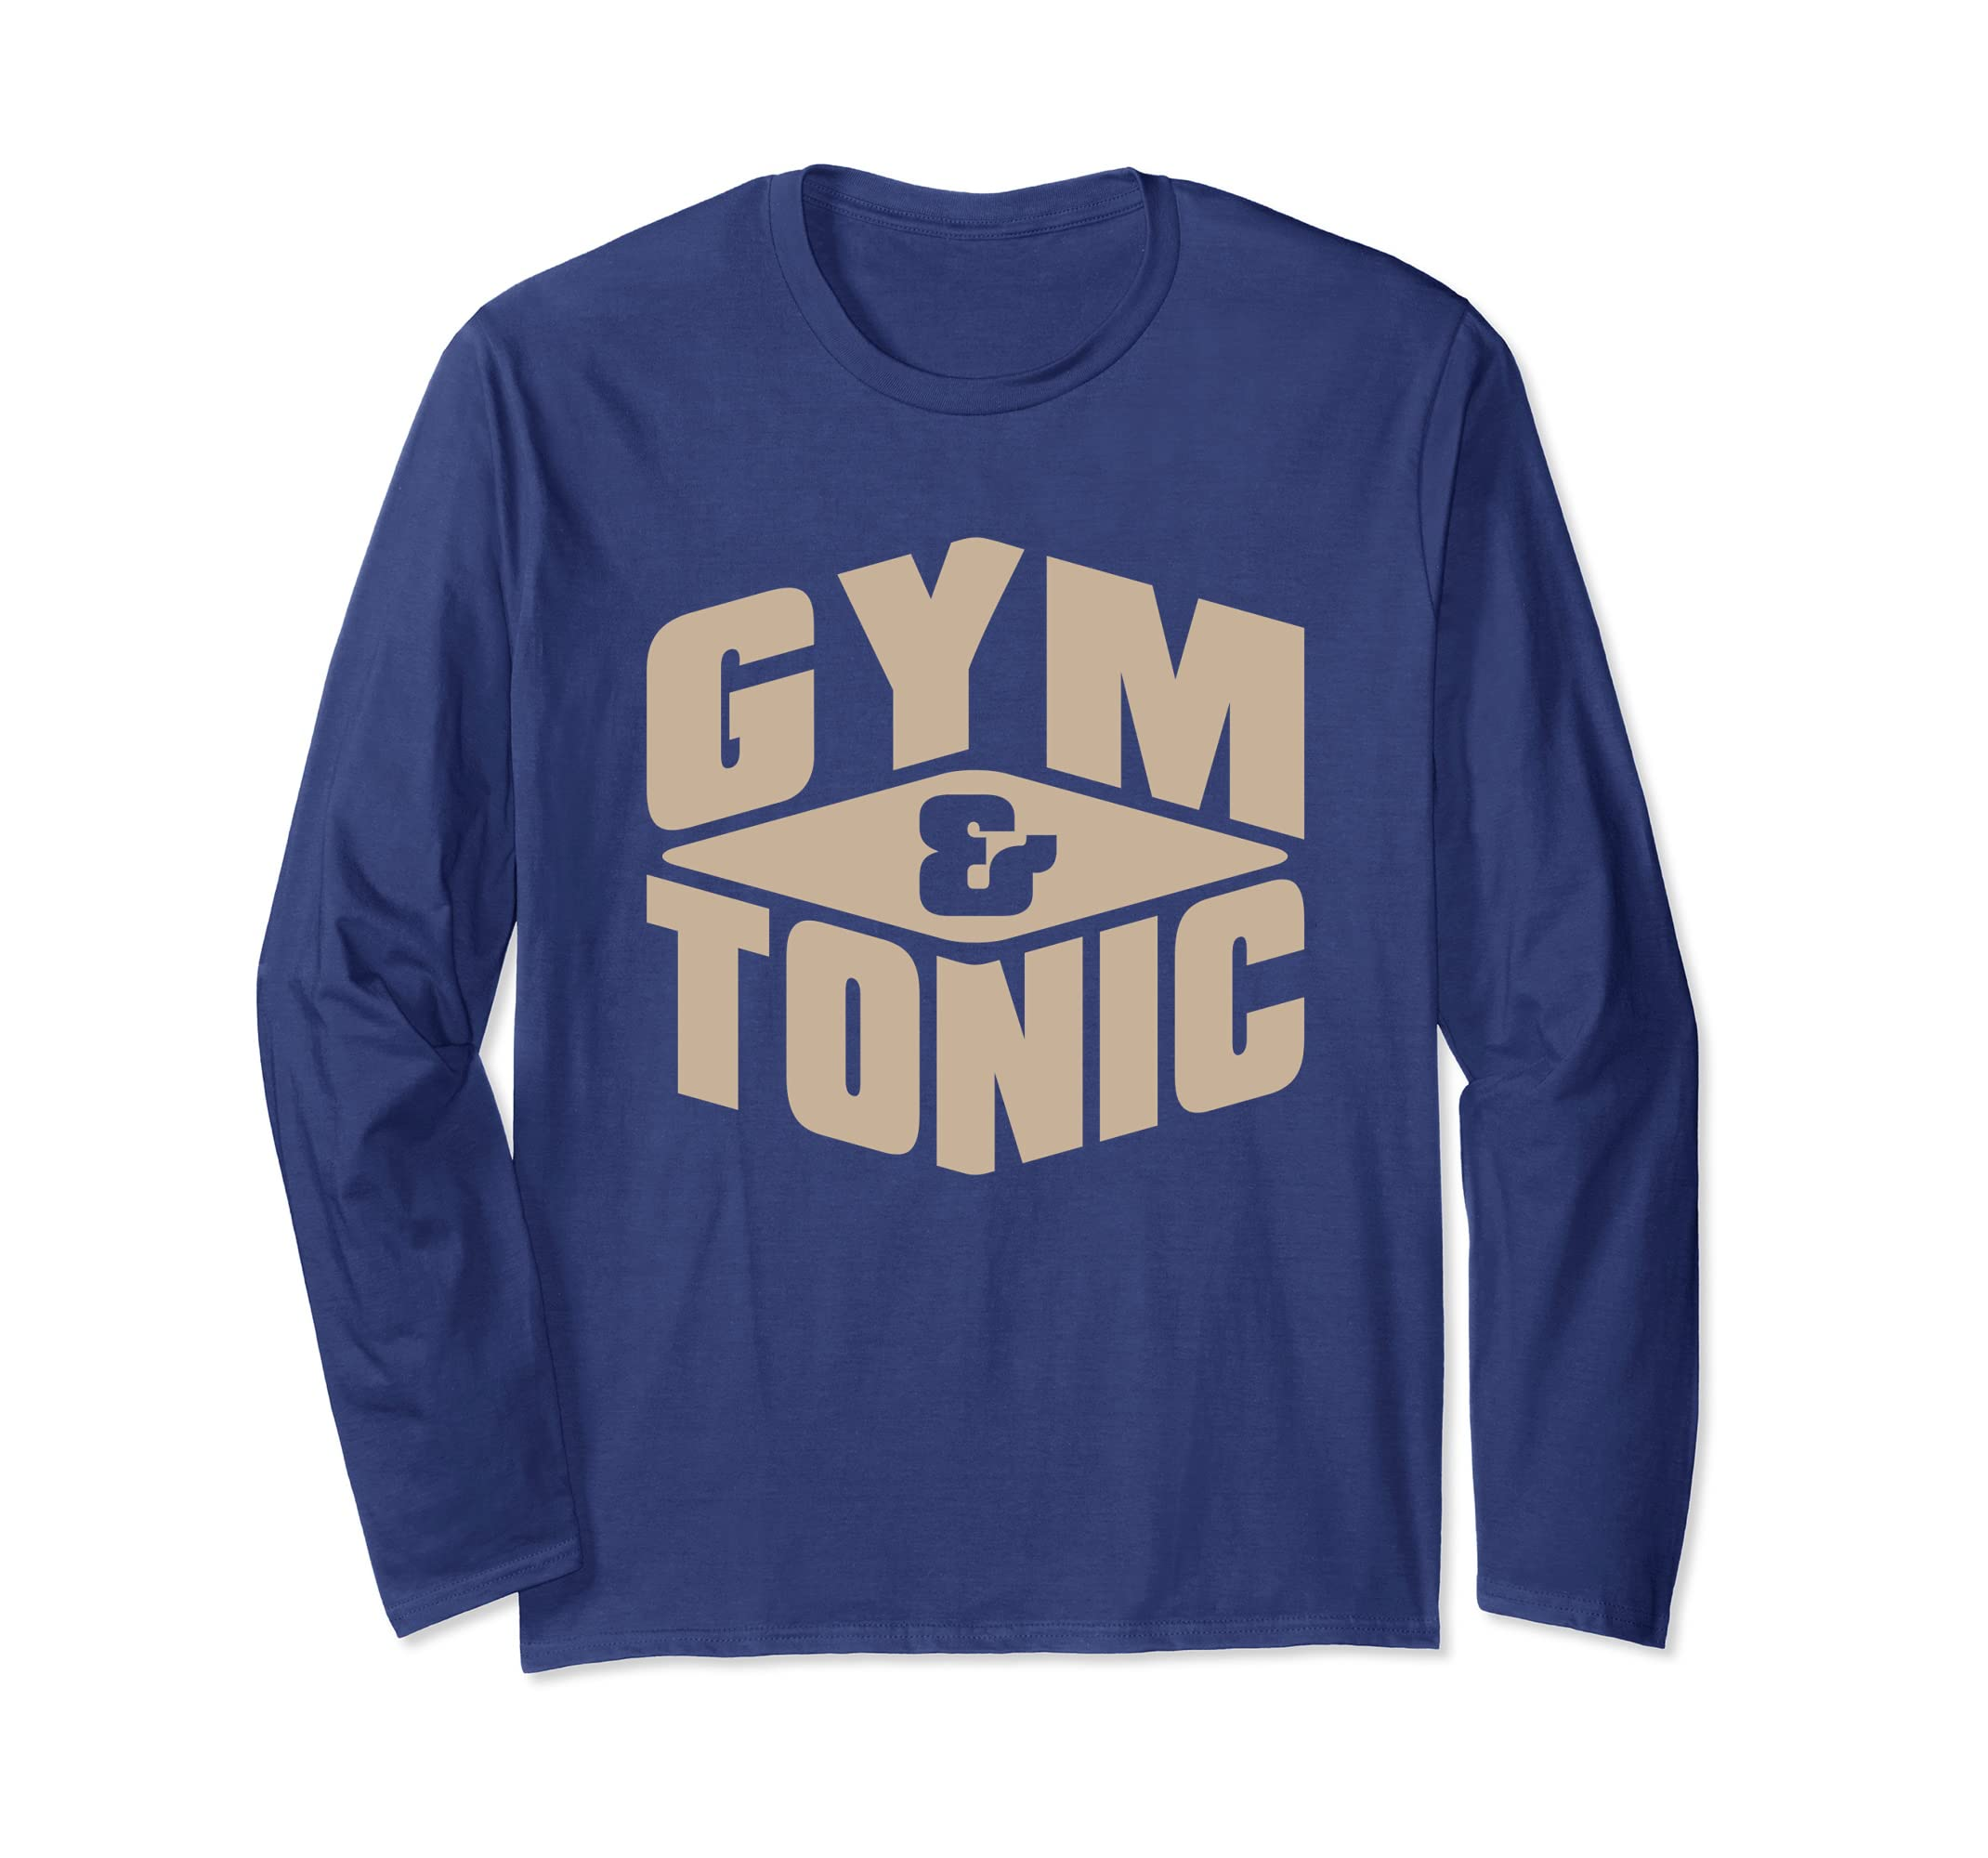 c856bf44 Funny Workout Shirt Gym and Tonic Men Women-ANZ ⋆ Anztshirt